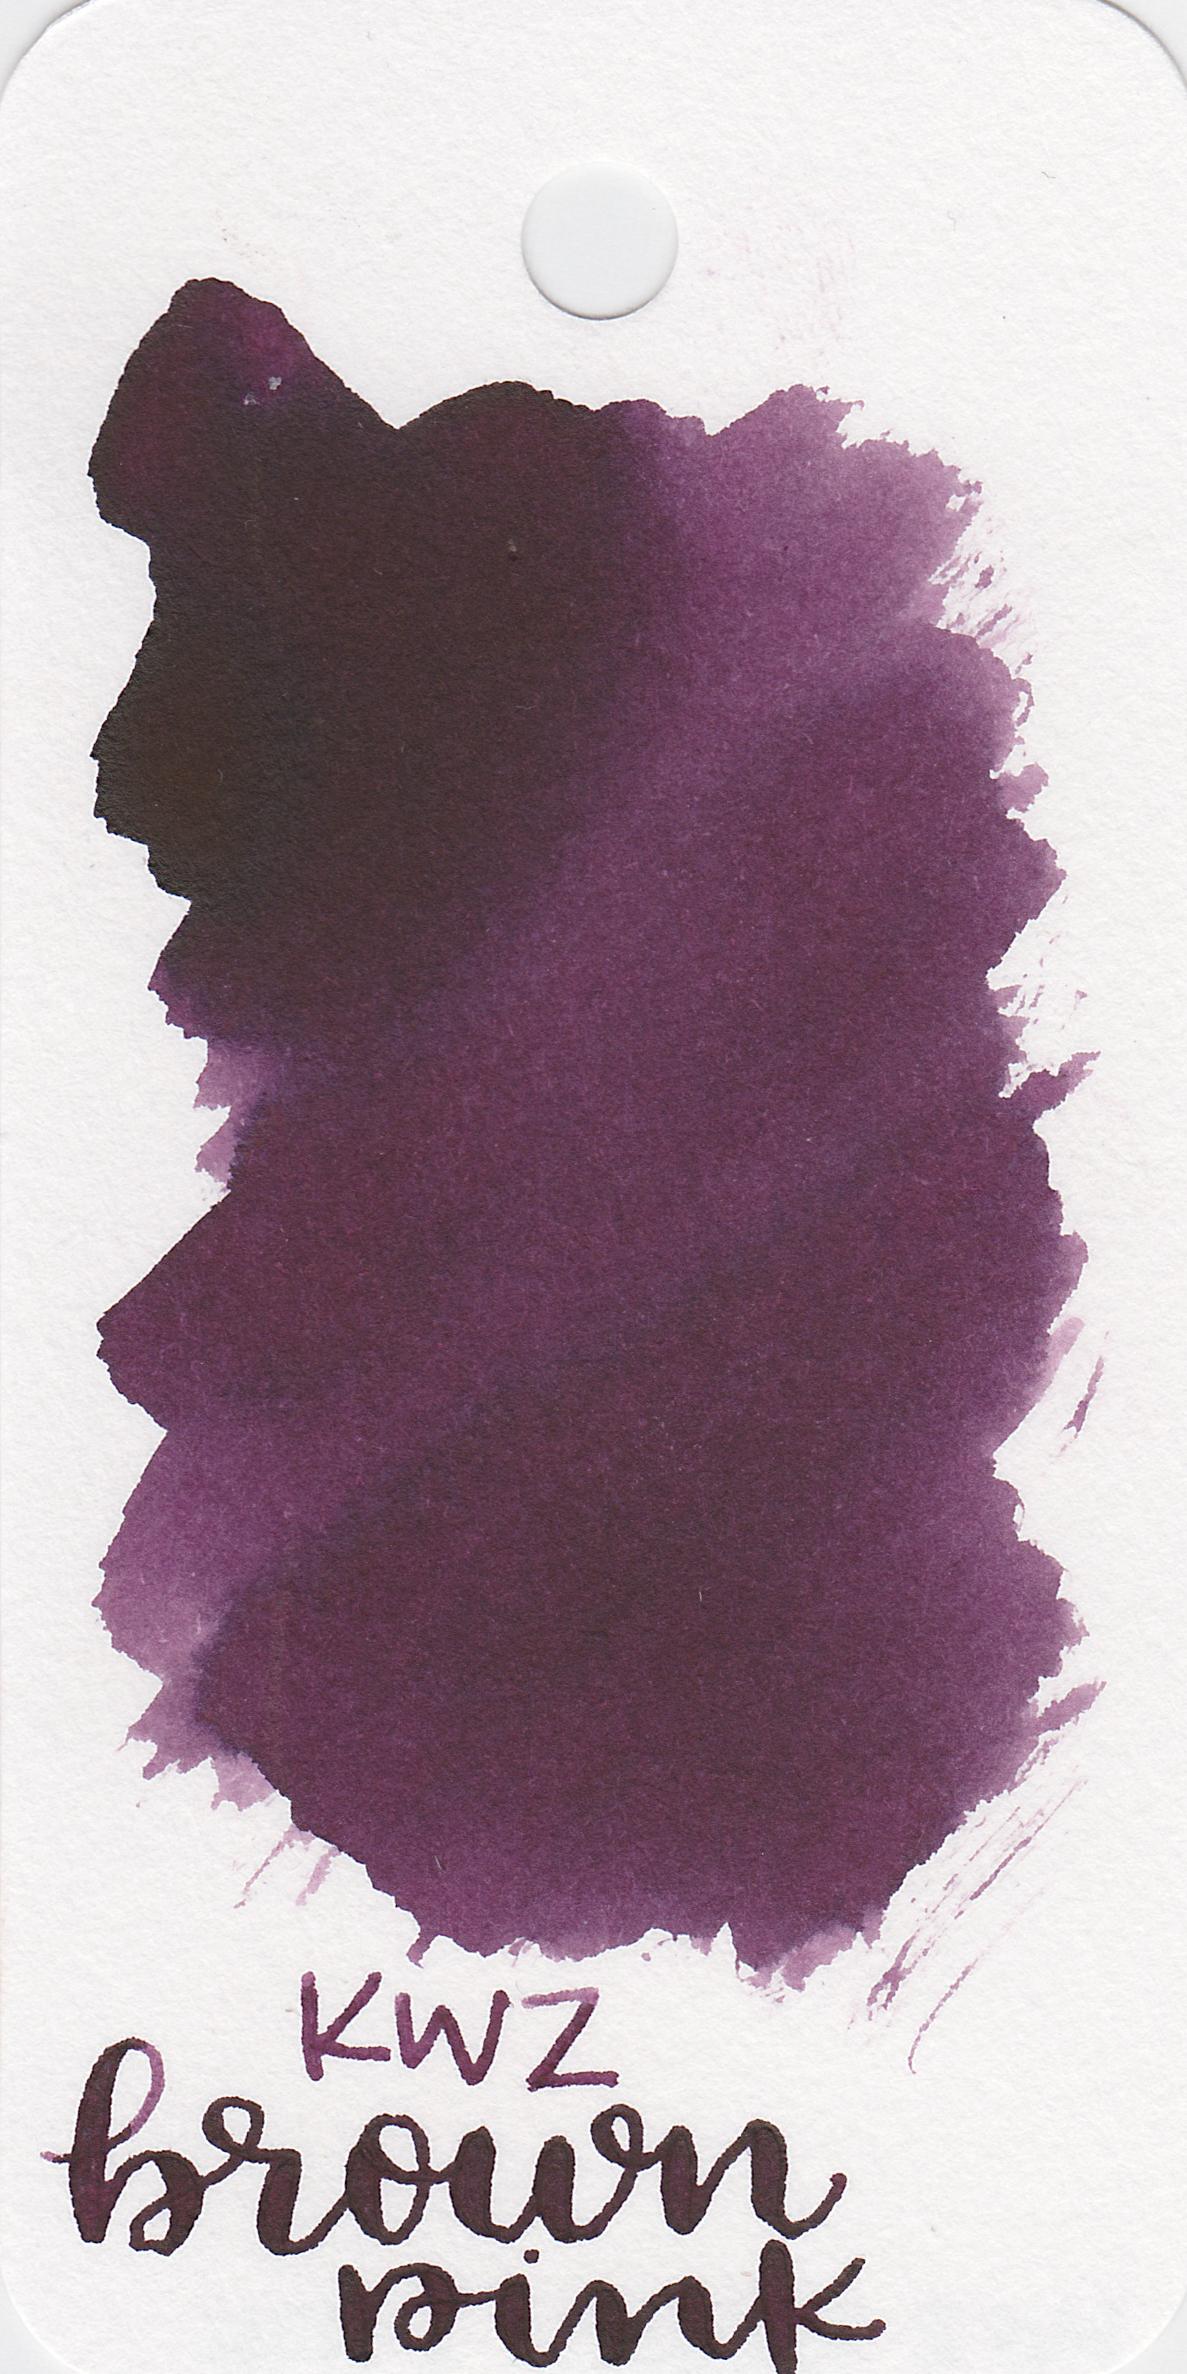 kwz-brown-pink-1.jpg